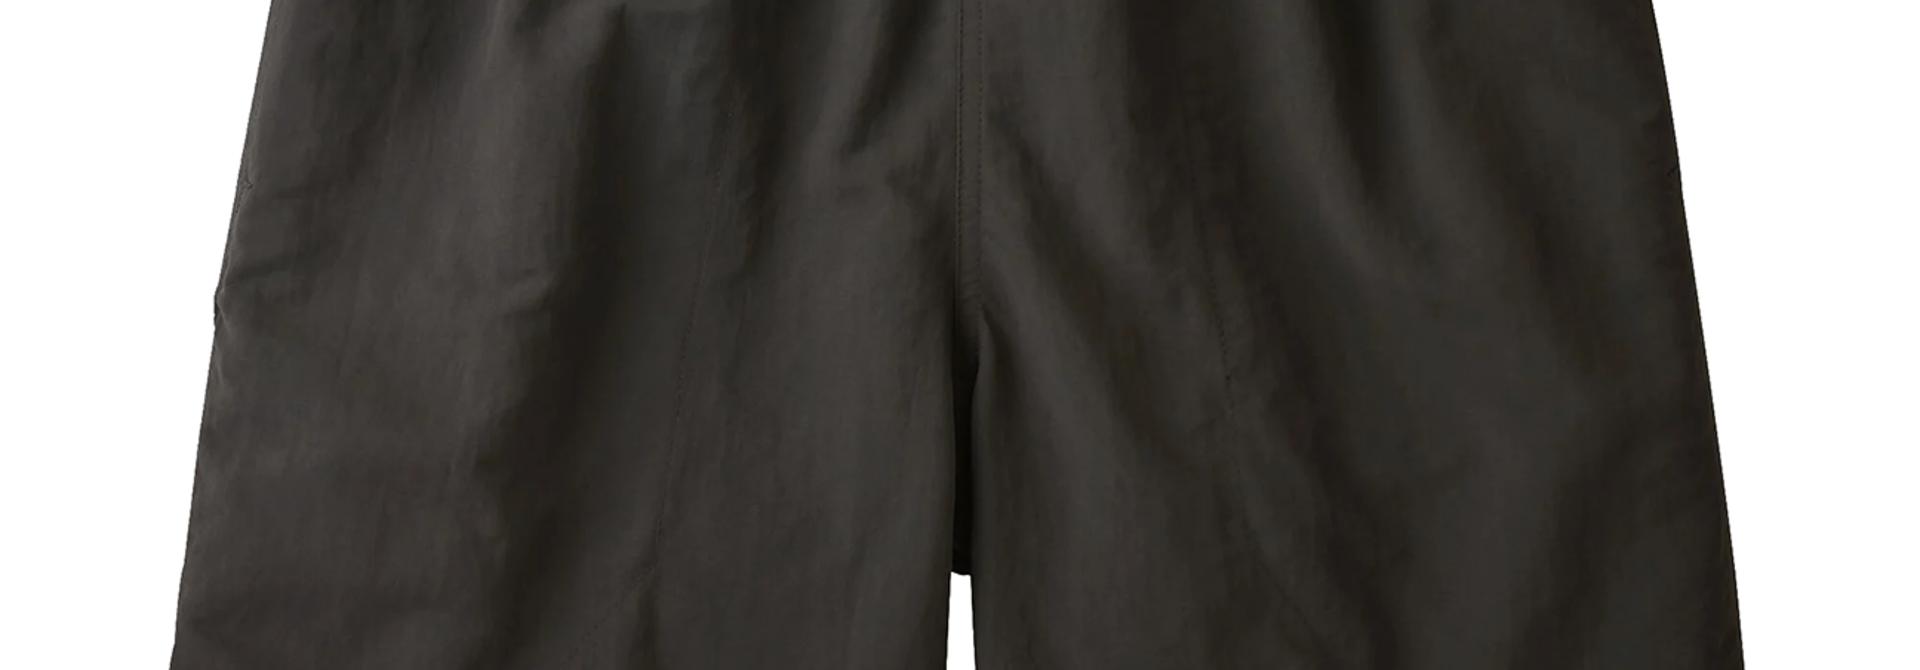 "Men's Baggies Shorts - 5"", Black"